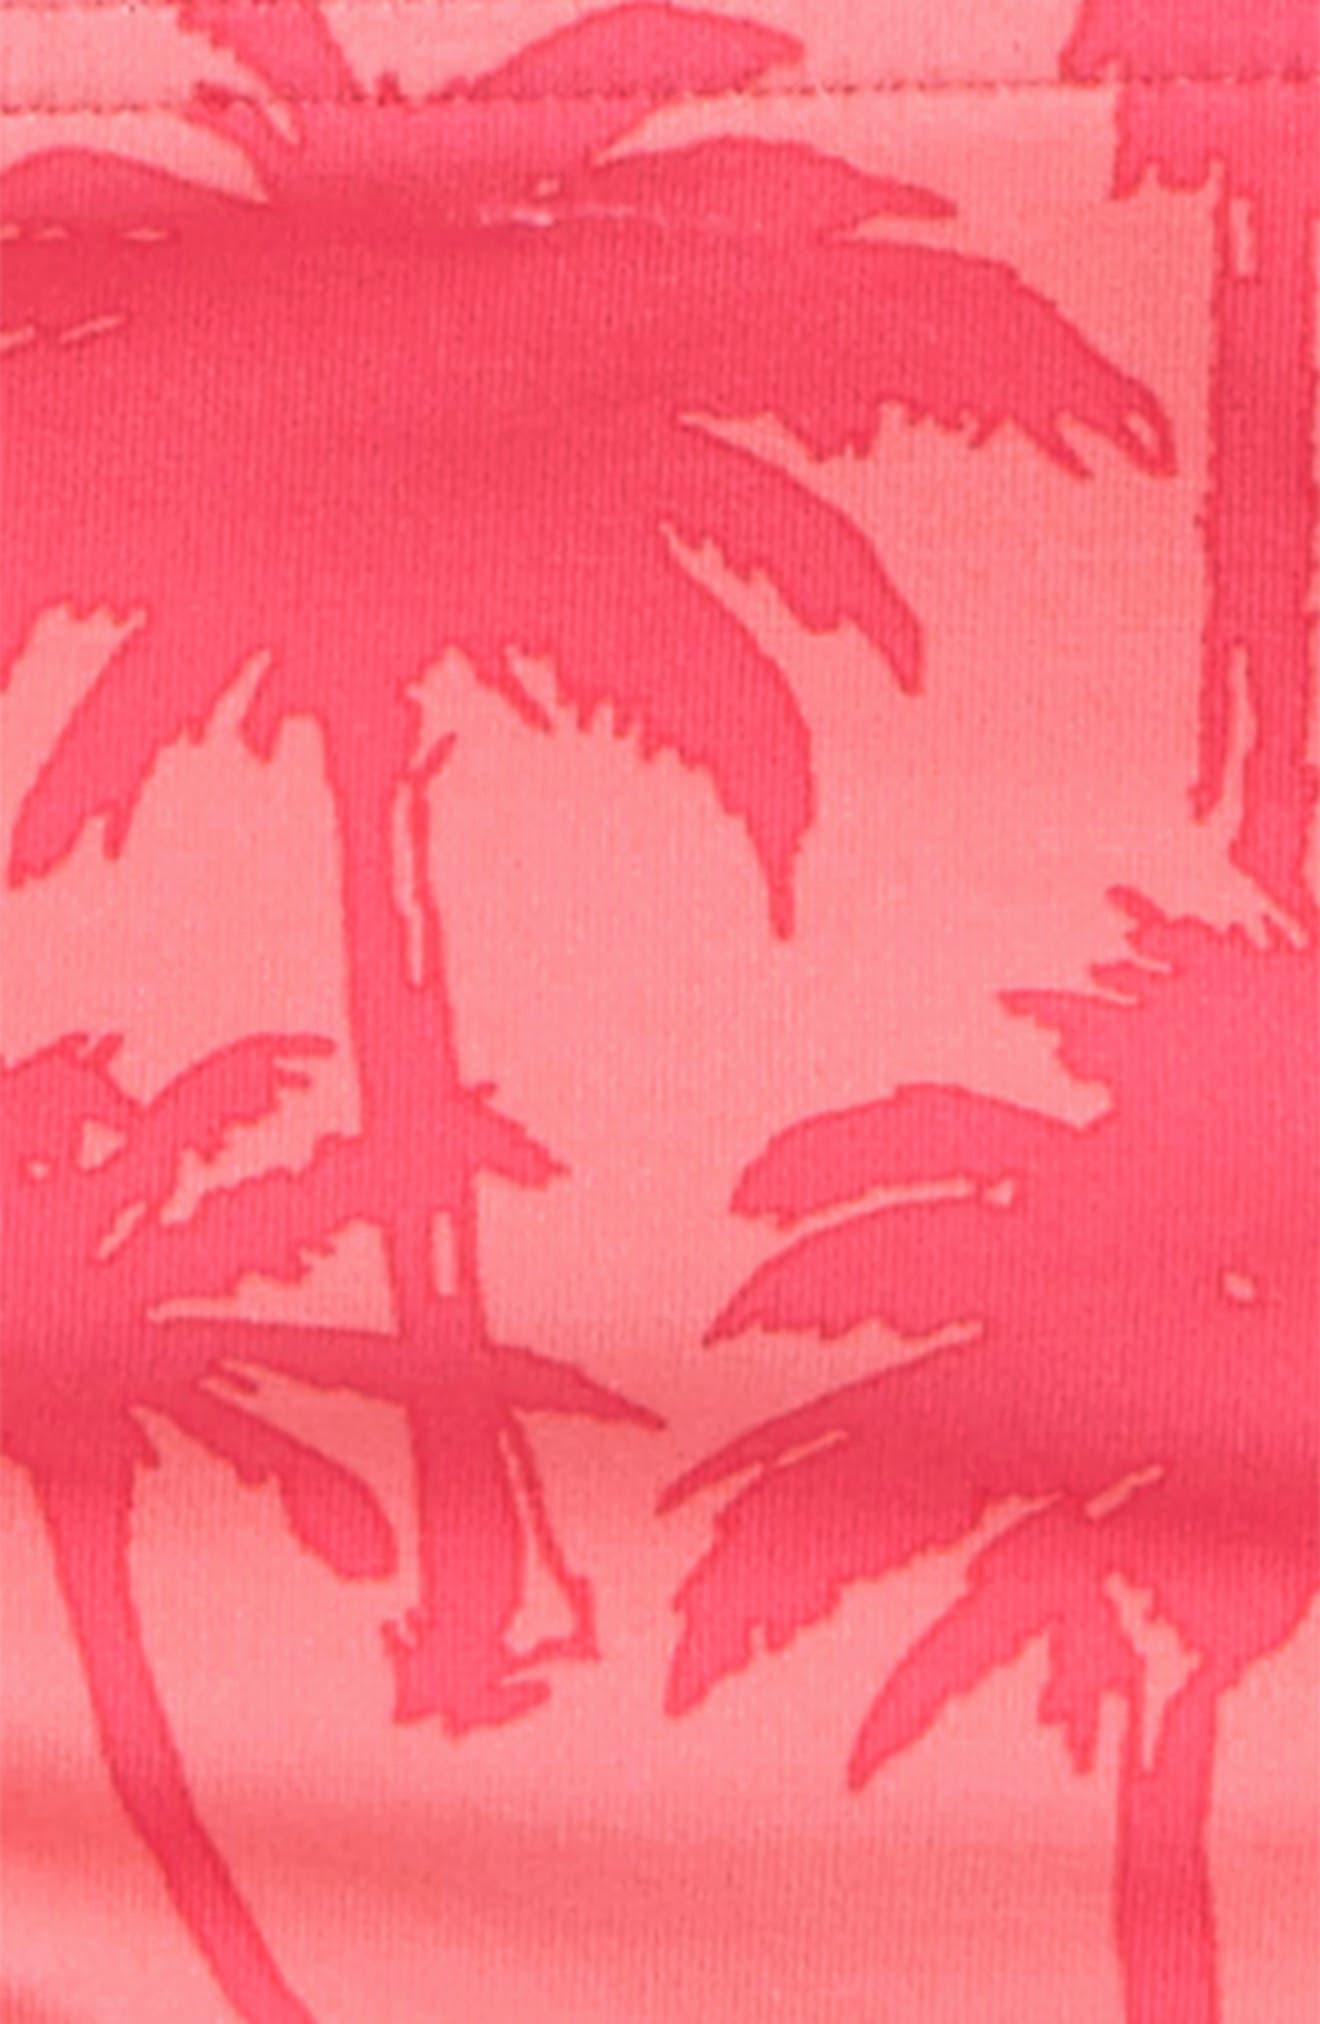 Palm Two-Piece Swimsuit,                             Main thumbnail 1, color,                             950